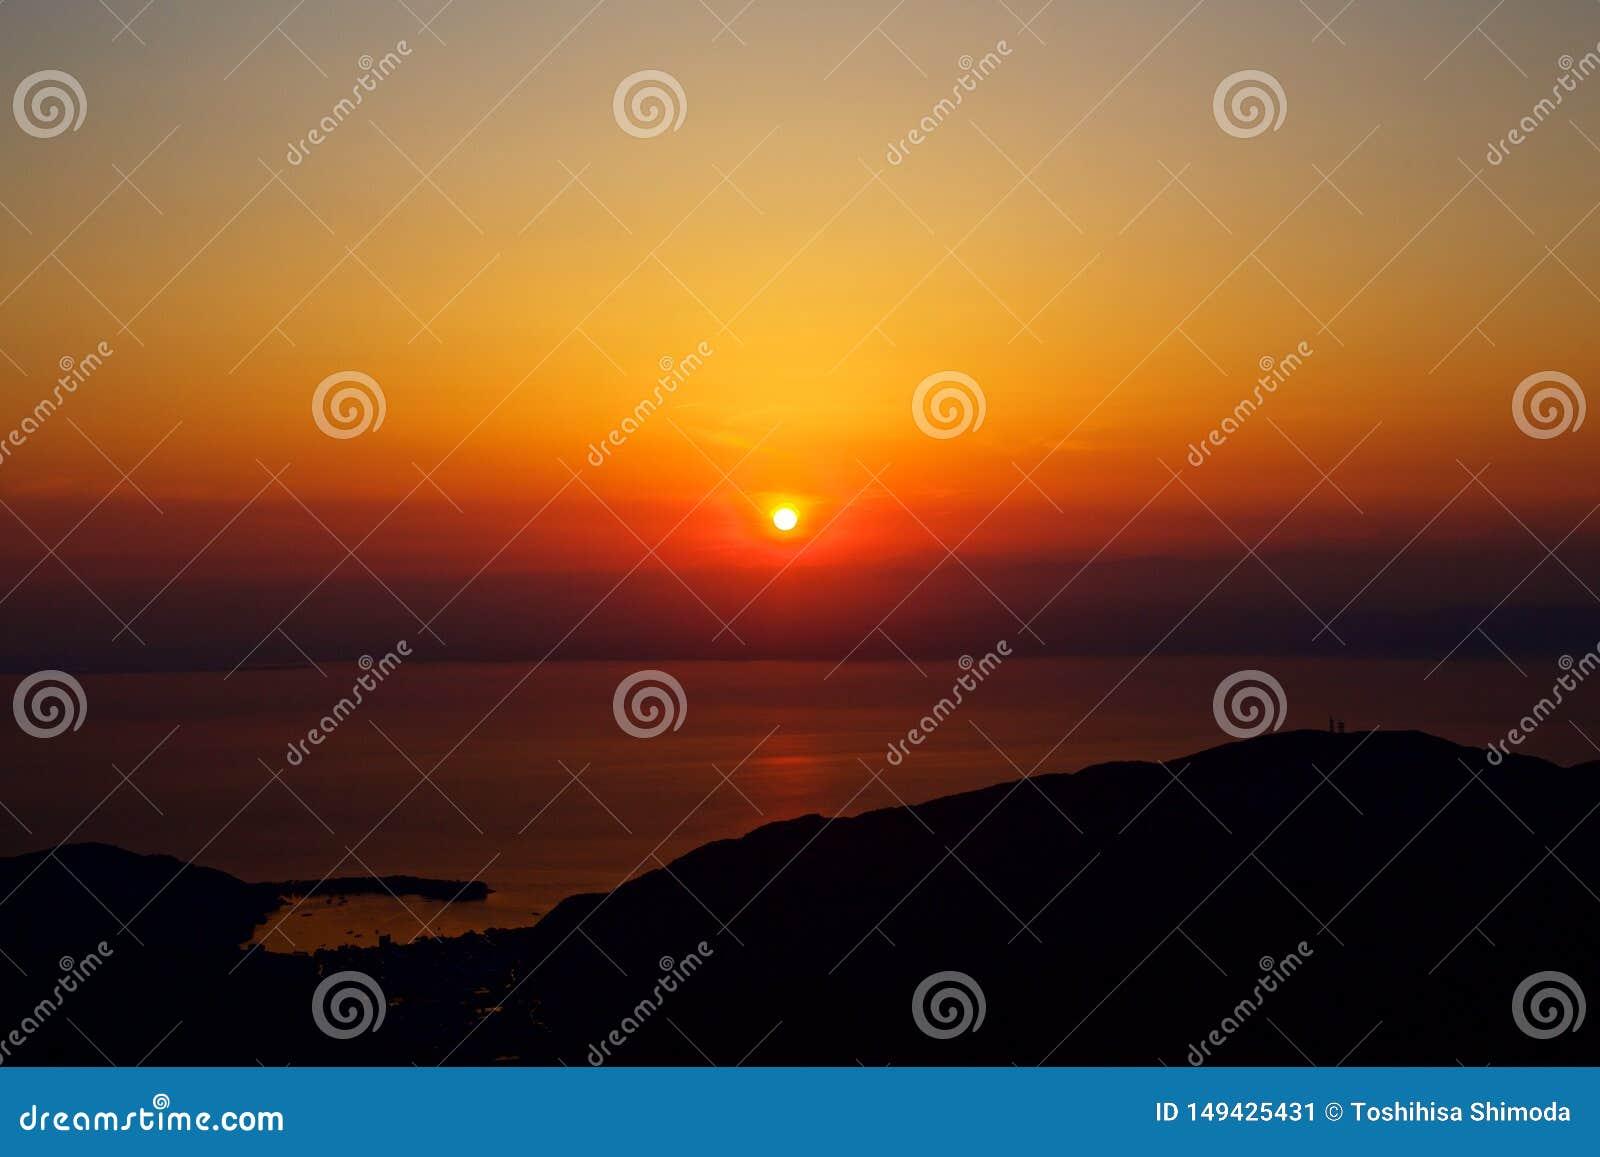 Sunset seen from Izu Peninsula.